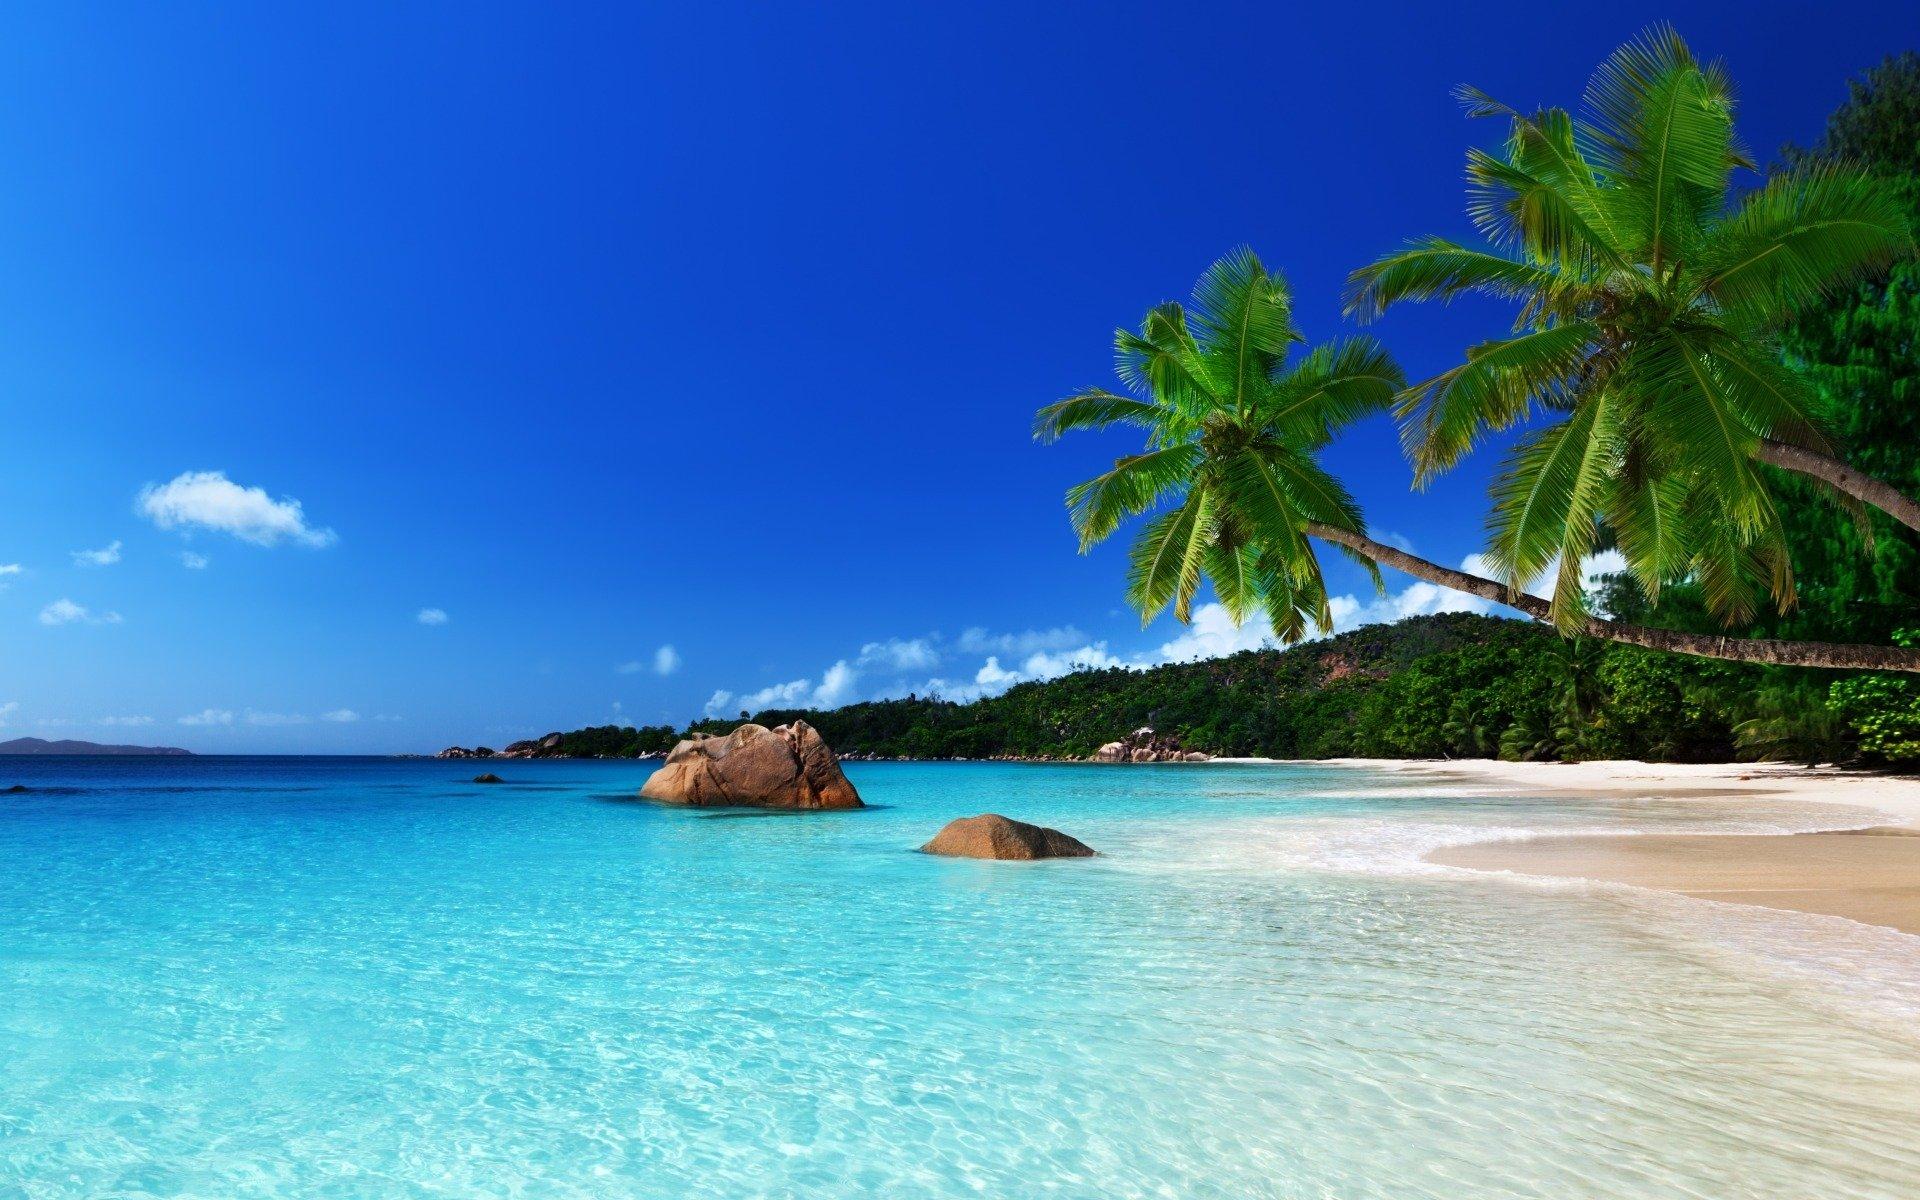 tropical-island Computer Wallpapers, Desktop Backgrounds | 1920x1200 ...